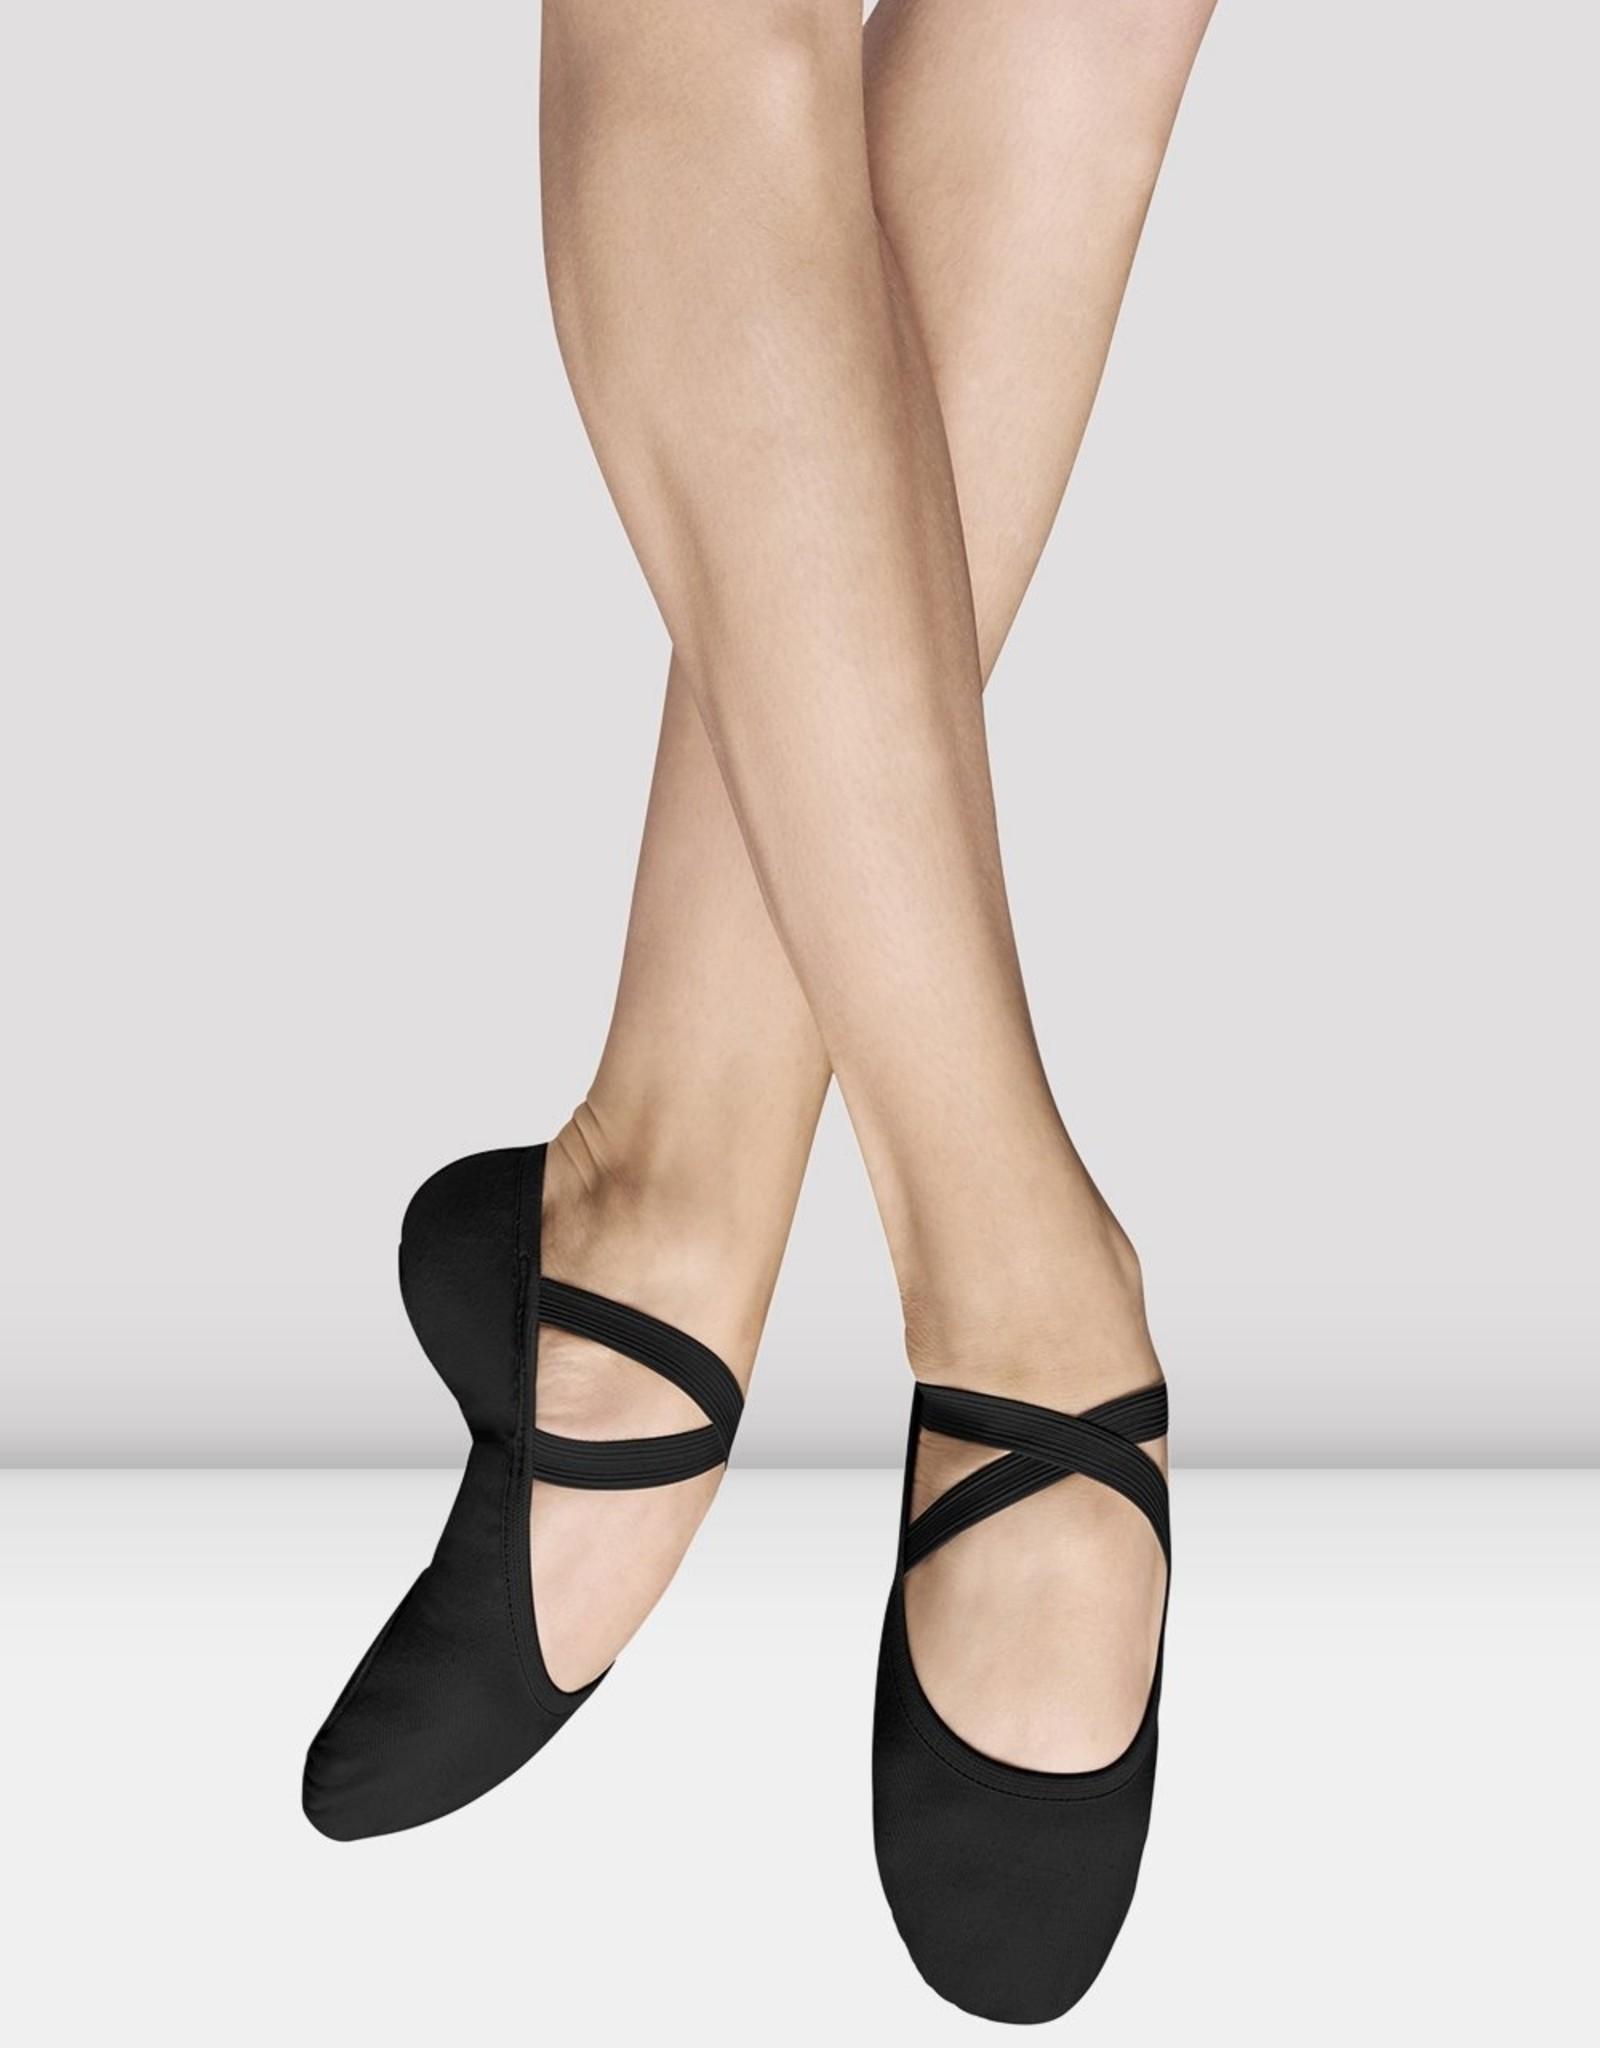 Bloch Bloch Mens Performa Ballet Shoe- S0284M